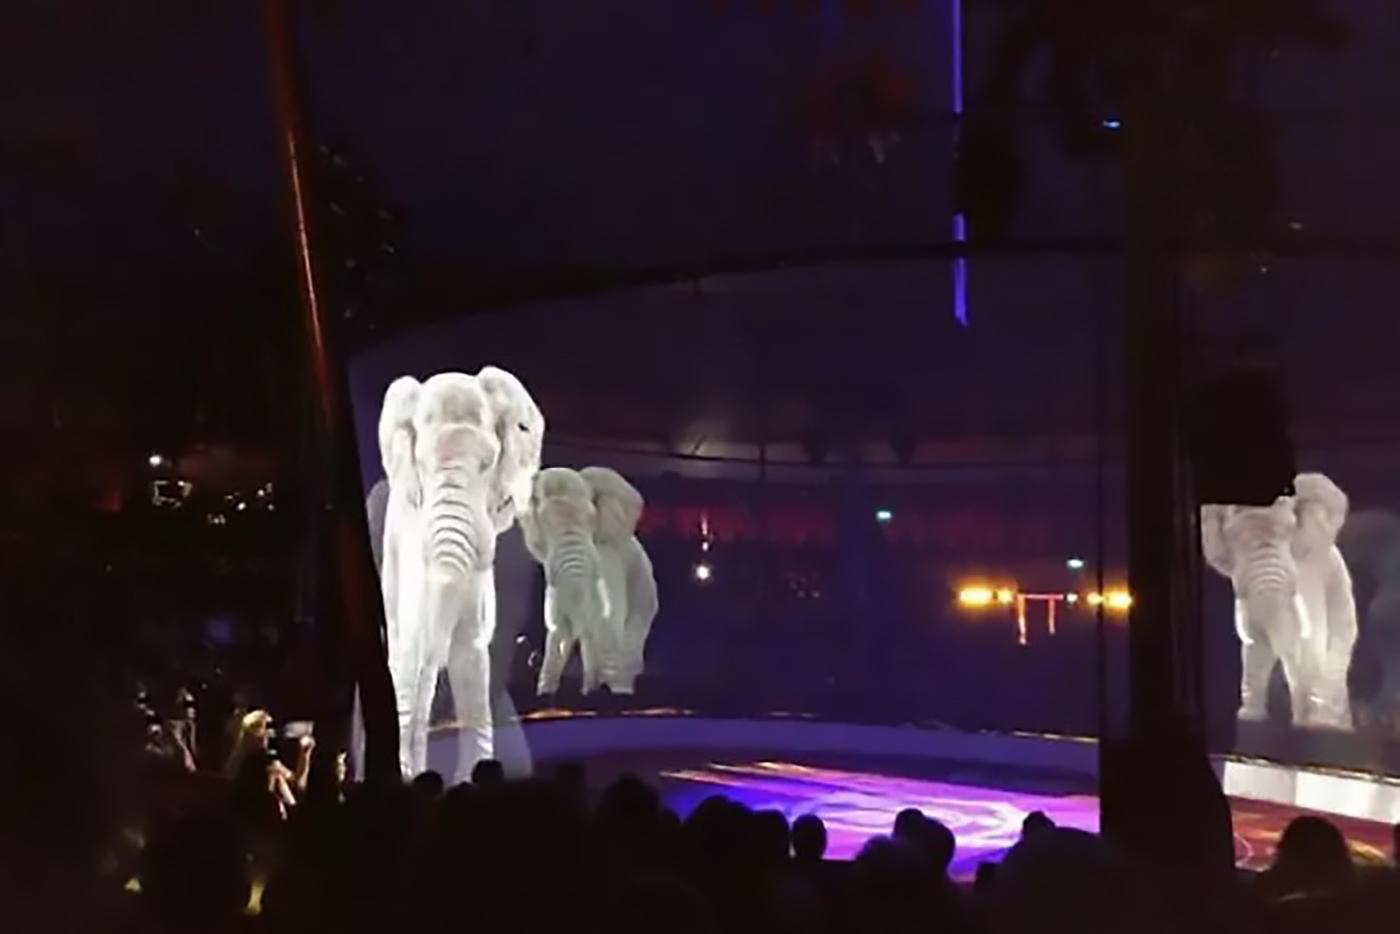 circul cu holograme protectia animalelor